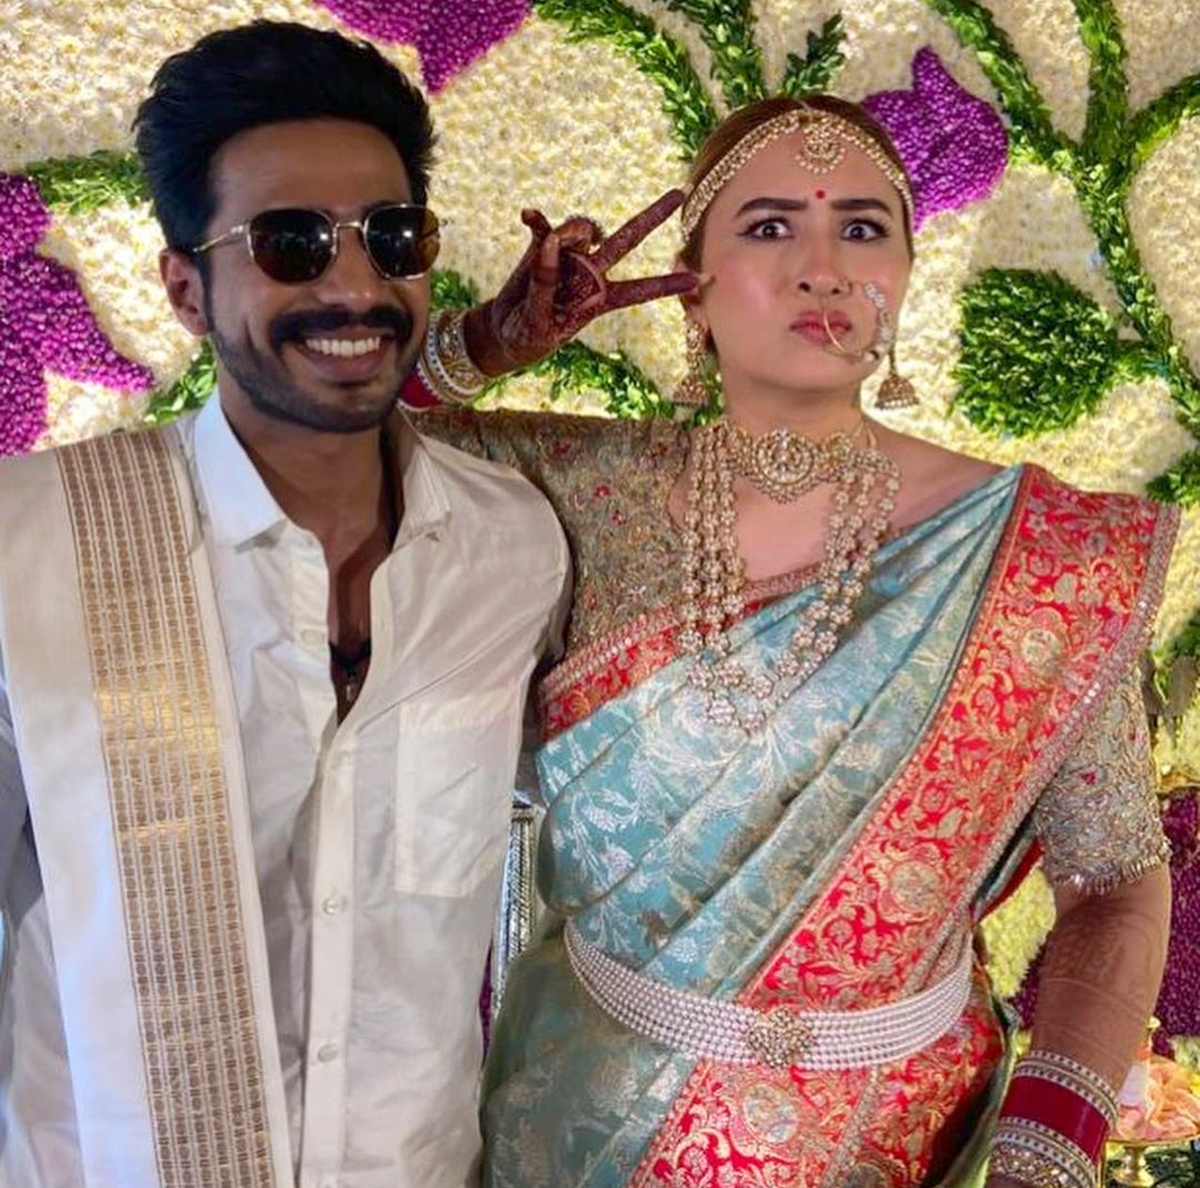 The designer behind Jwala's wedding gown